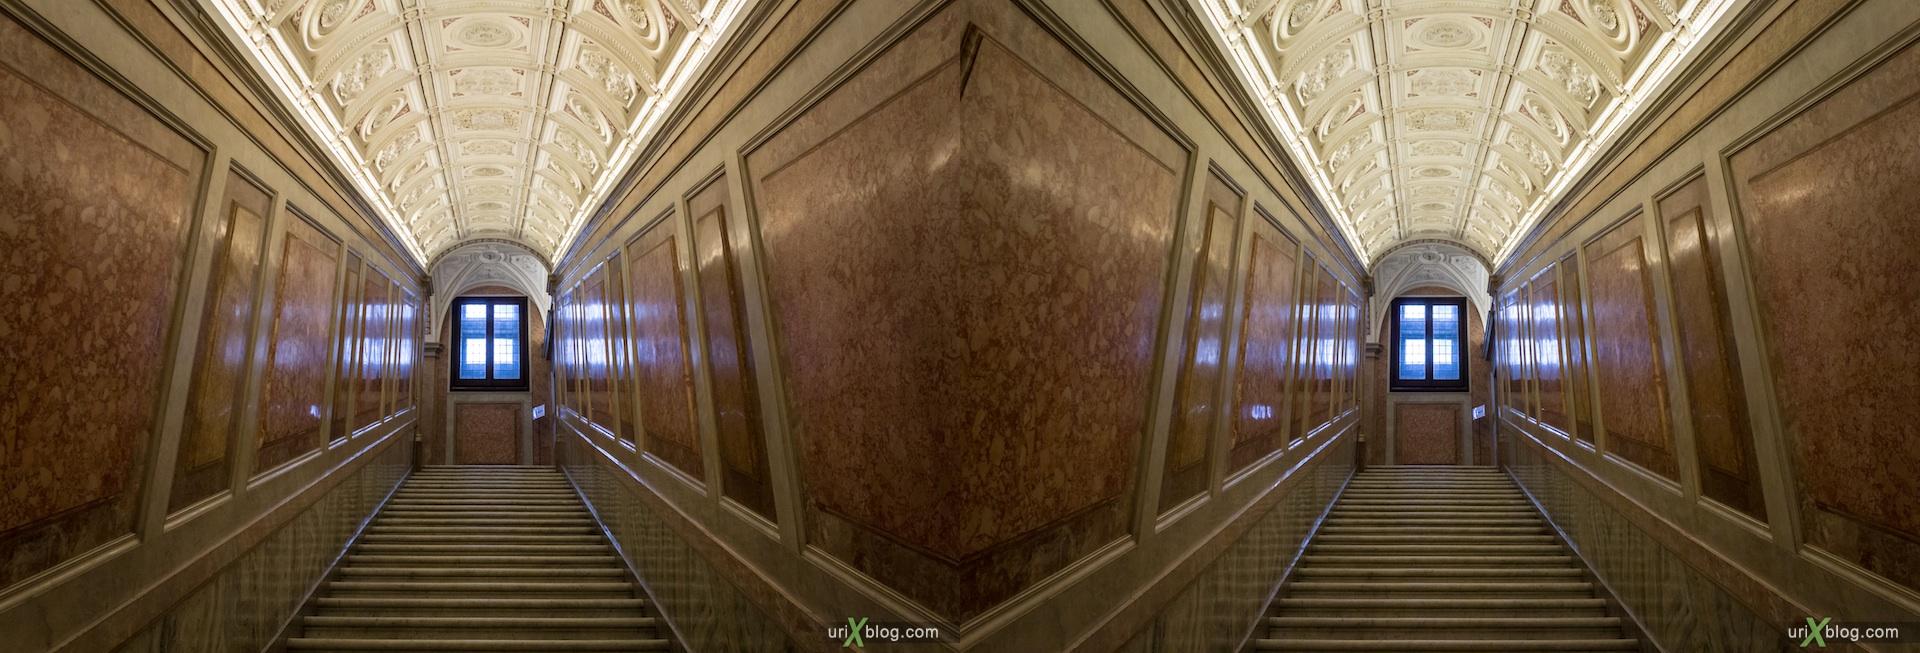 2012, Villa Farnesina, stairs, Rome, Italy, Europe, 3D, stereo pair, cross-eyed, crossview, cross view stereo pair